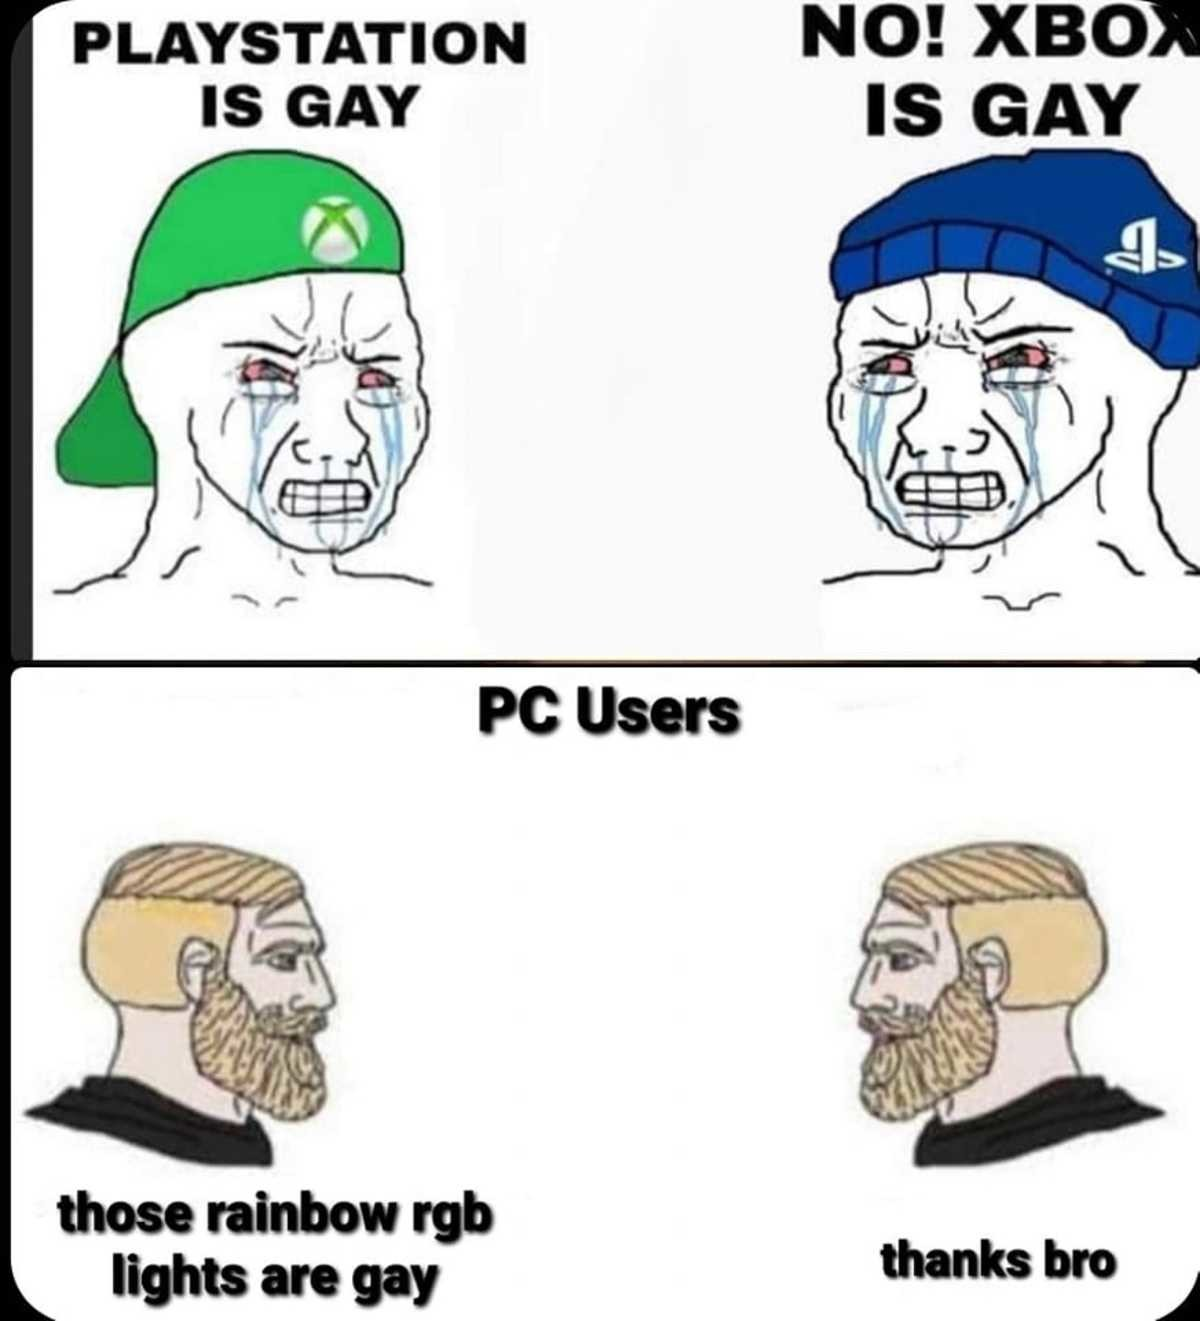 elfin Skunk. .. Hey, hey, all gamers are gay.